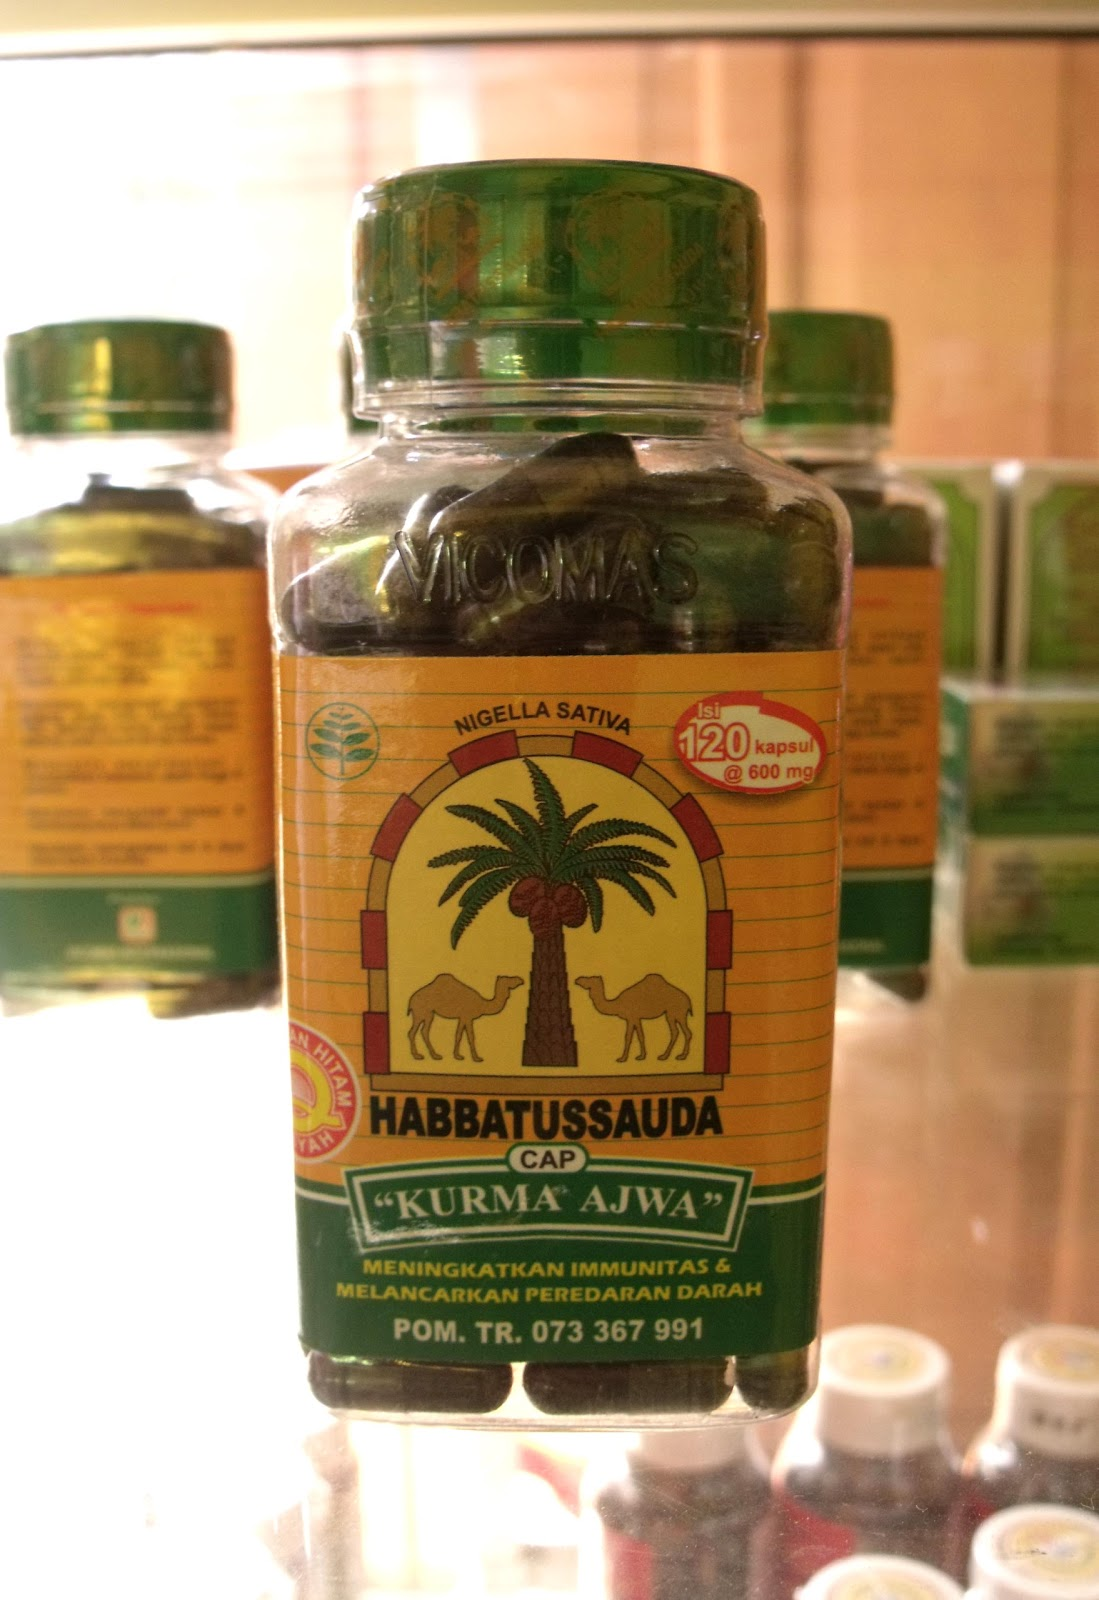 Pesan Herbal Online Hebal Murah Harga Grosir Habbatussauda Kurma Ajwa 120 Kapsul Kap